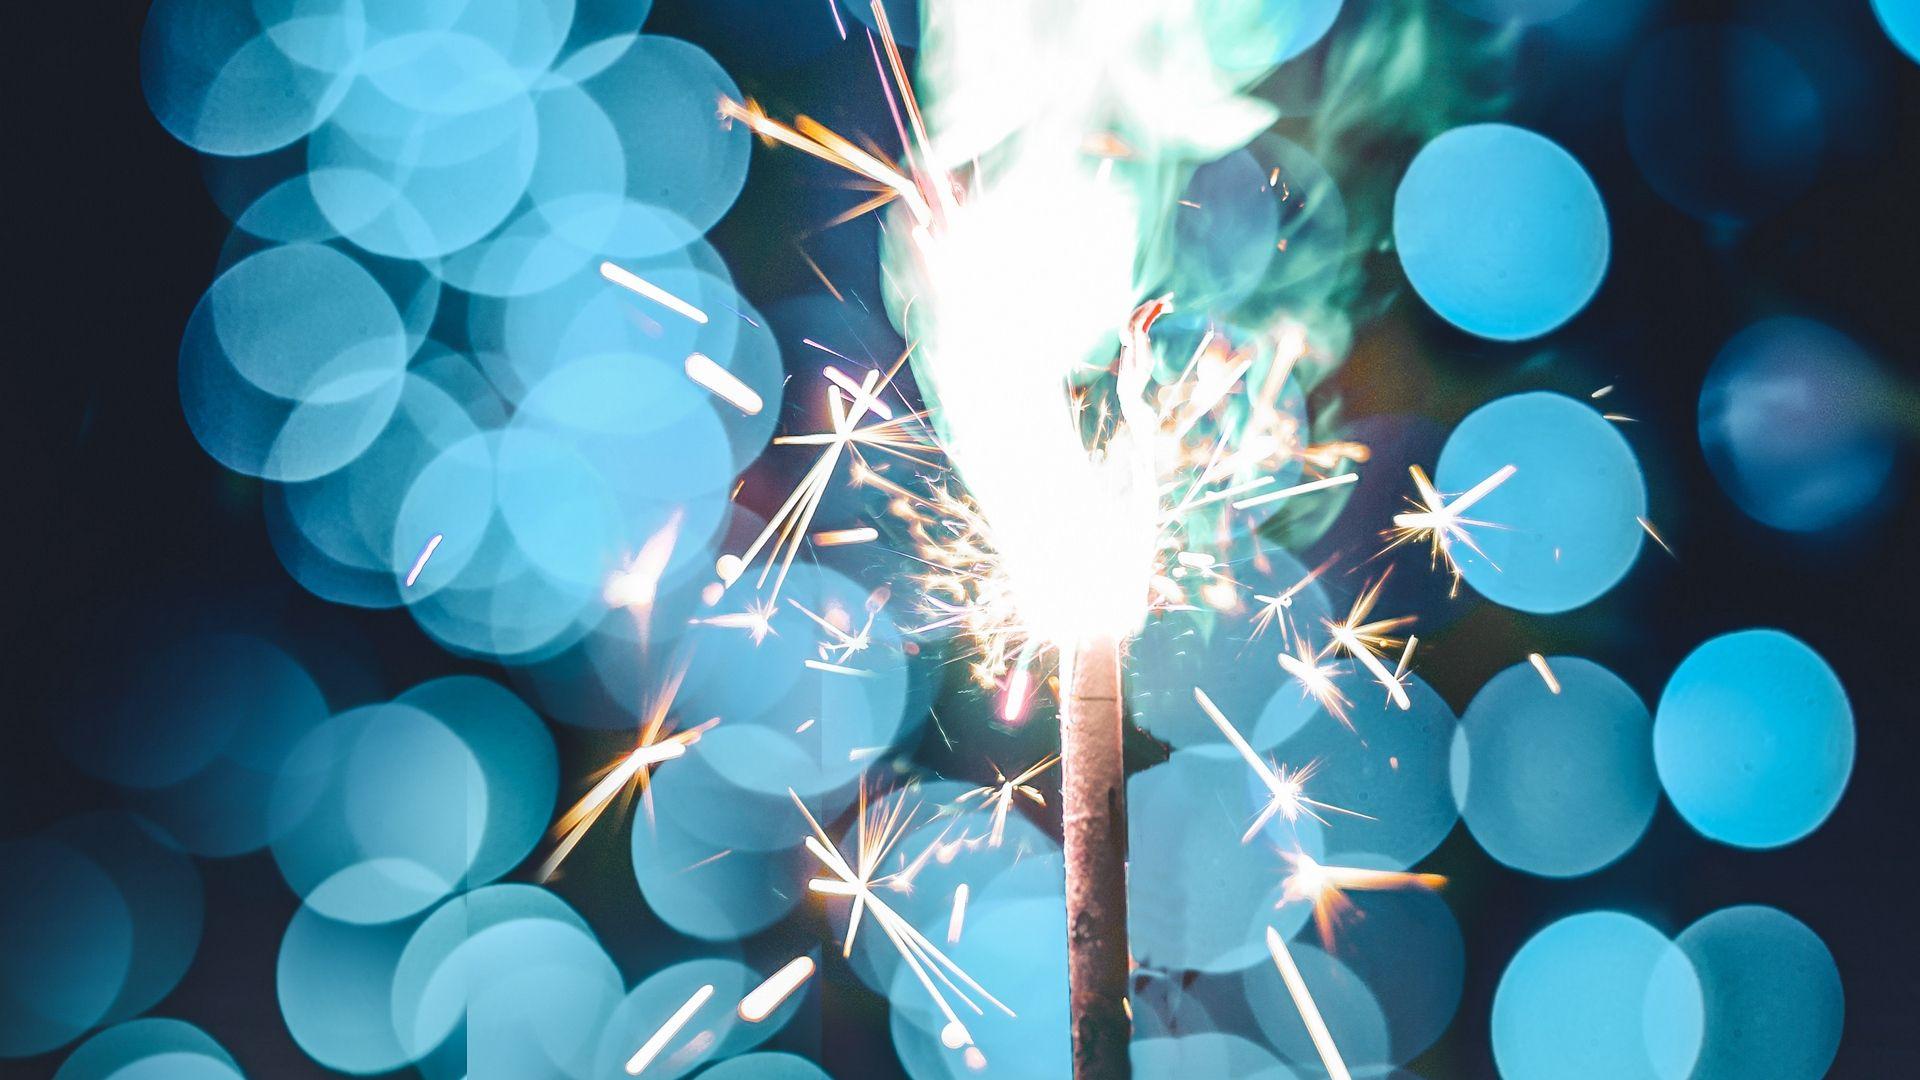 Sparkler Bucket hd wallpaper 1080p for pc